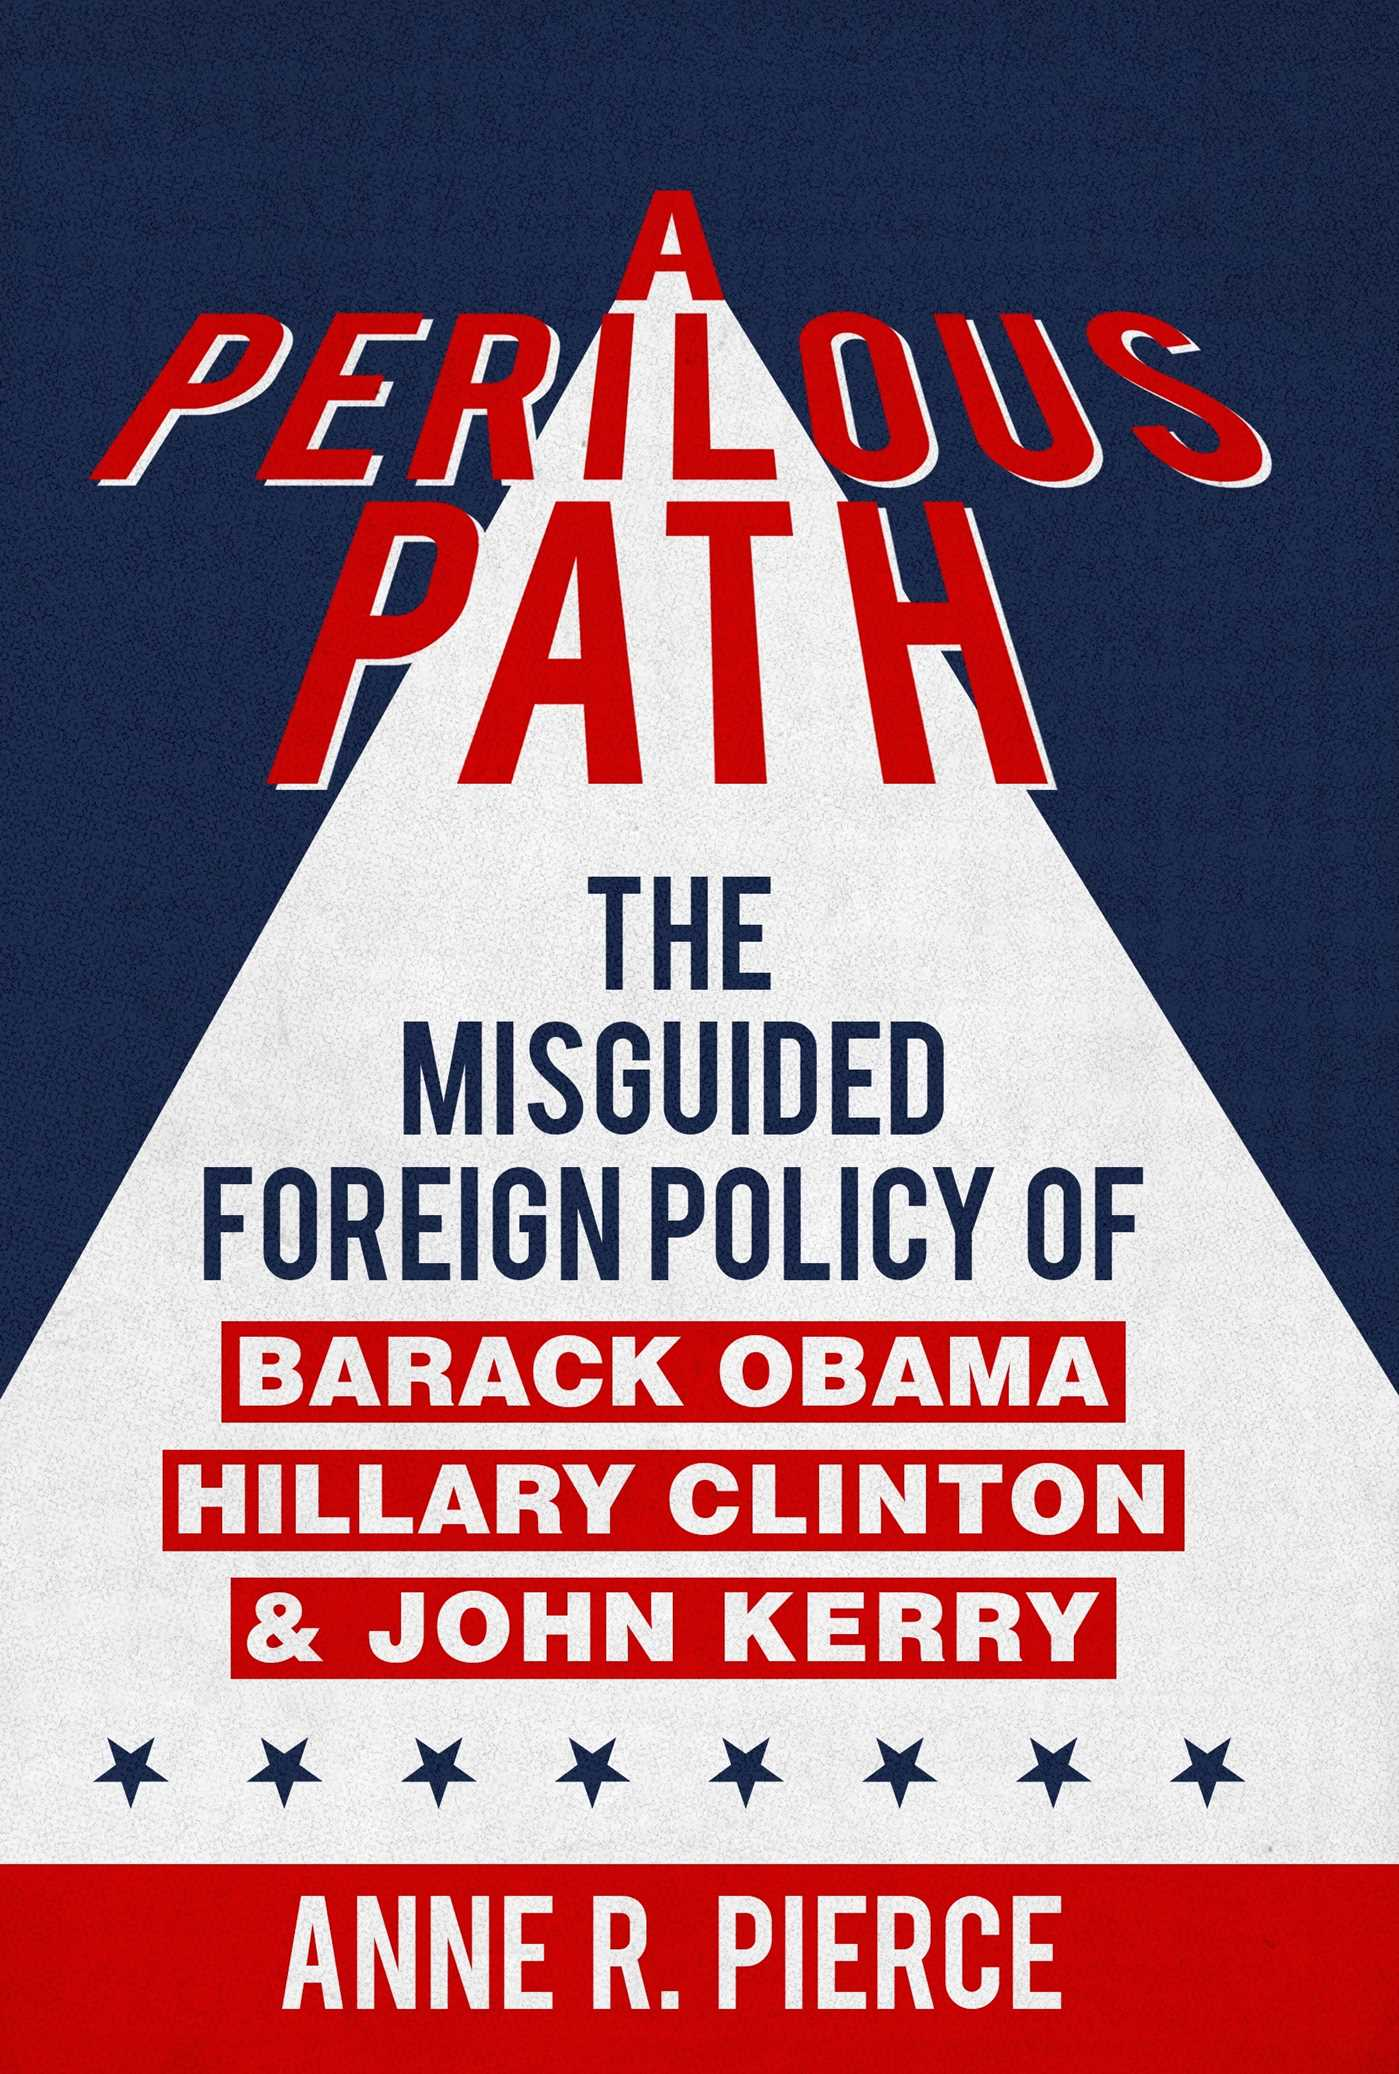 A perilous path 9781682610589 hr